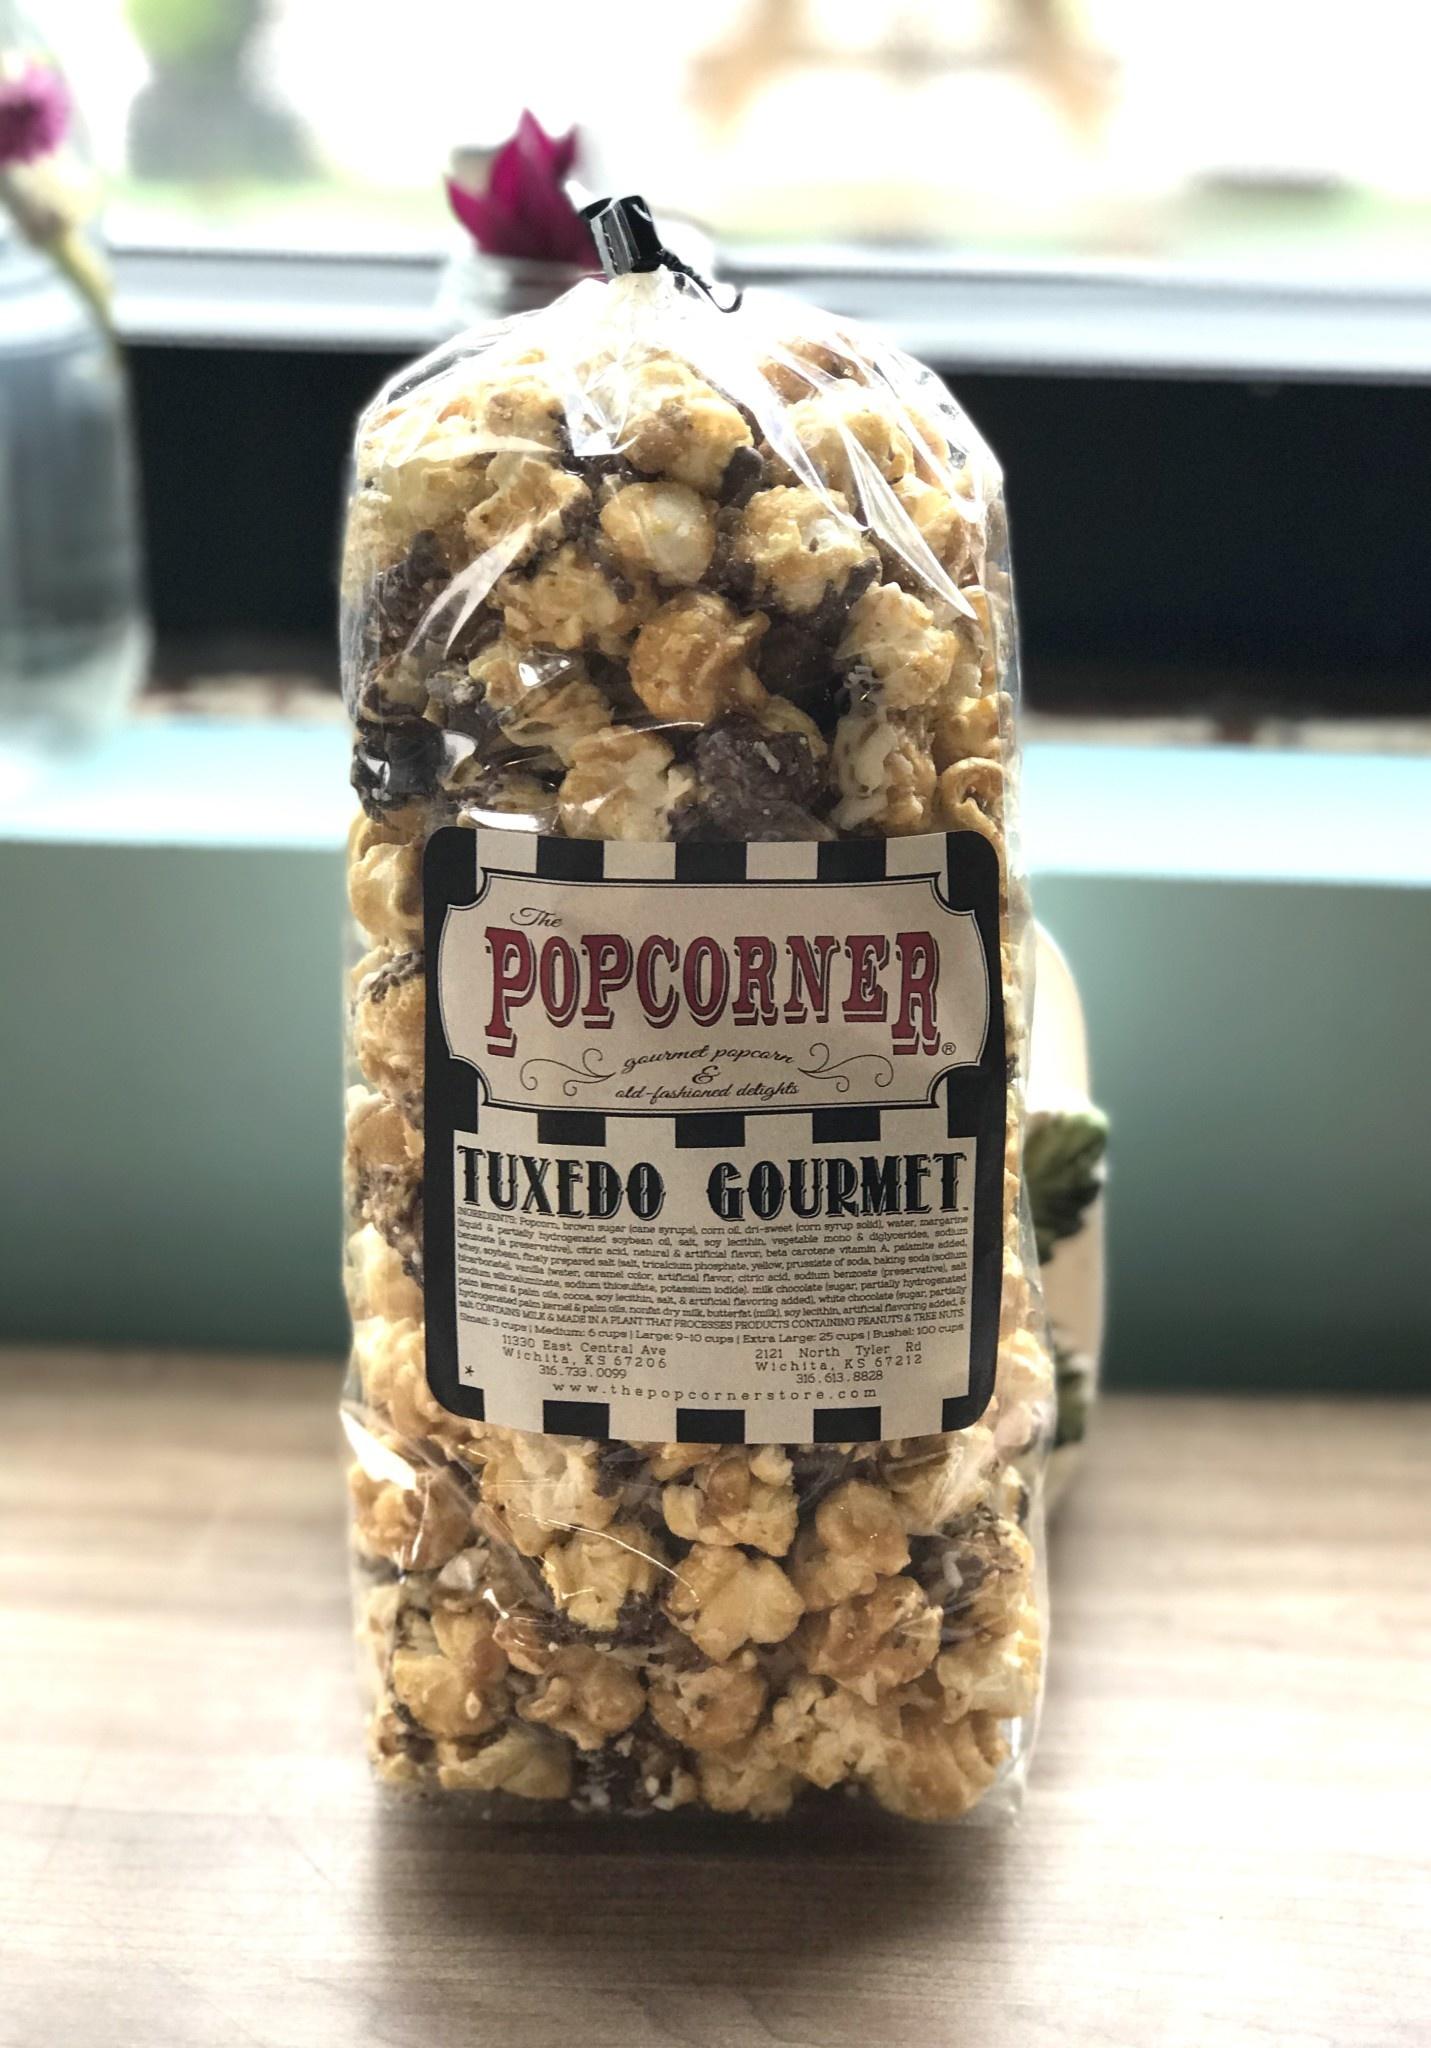 The Popcorner Popcorner Popcorn